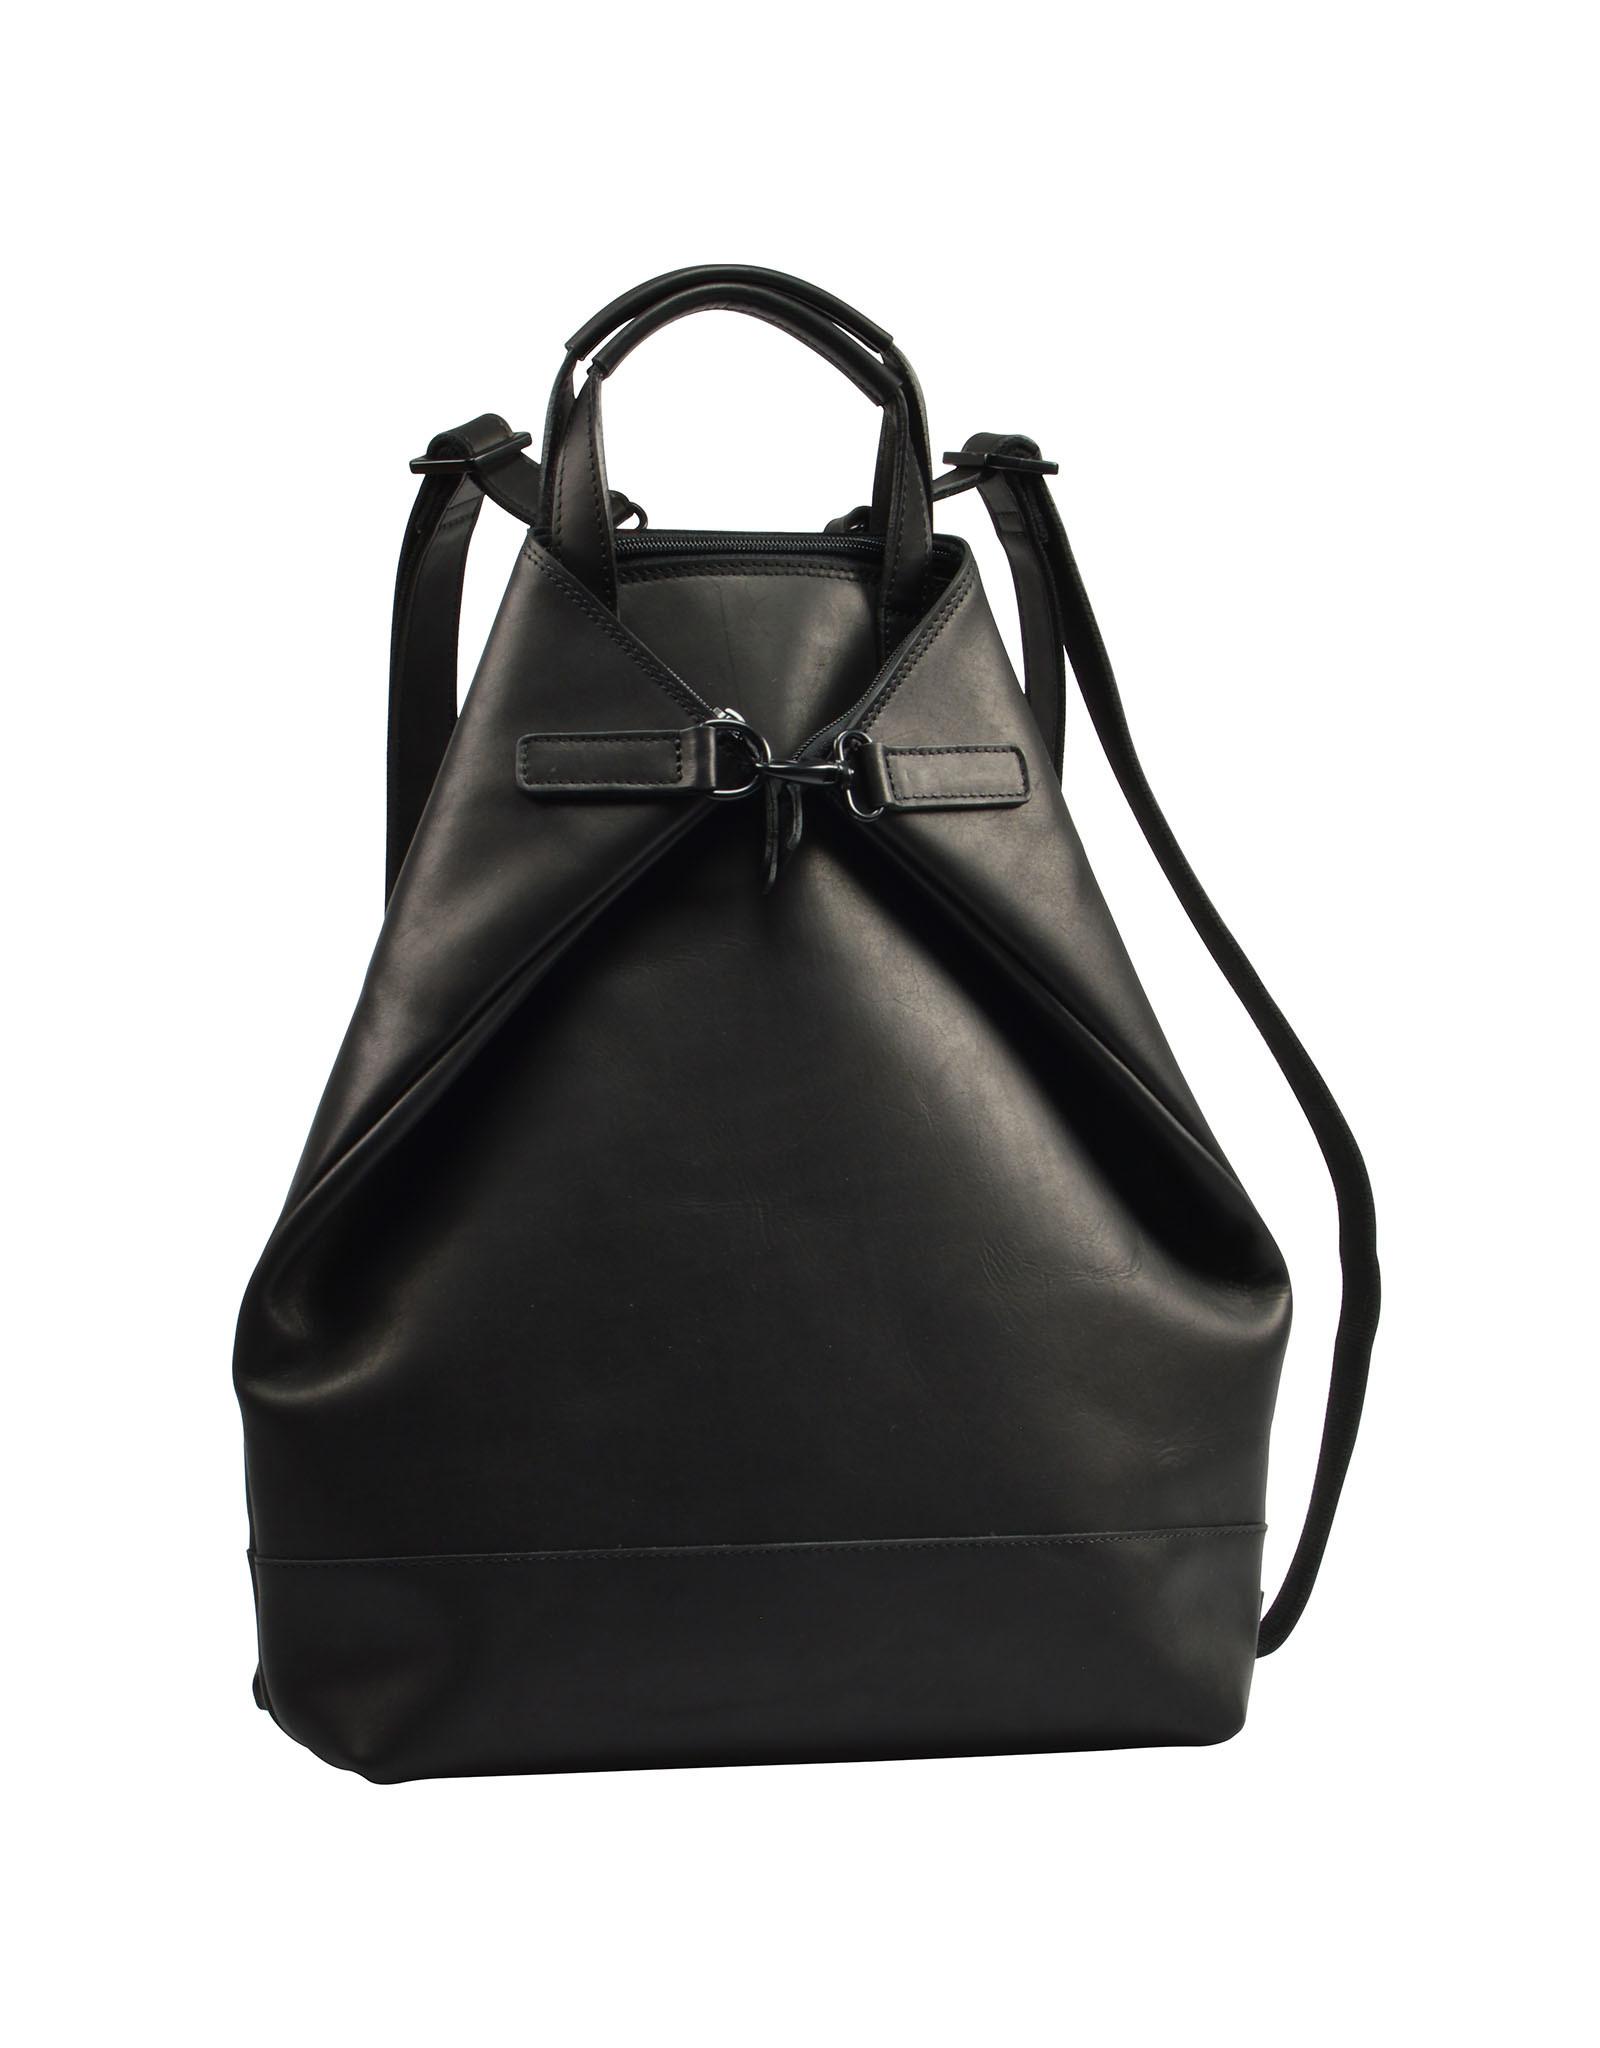 Jost Bags Futura Small X-Change Bag | Black